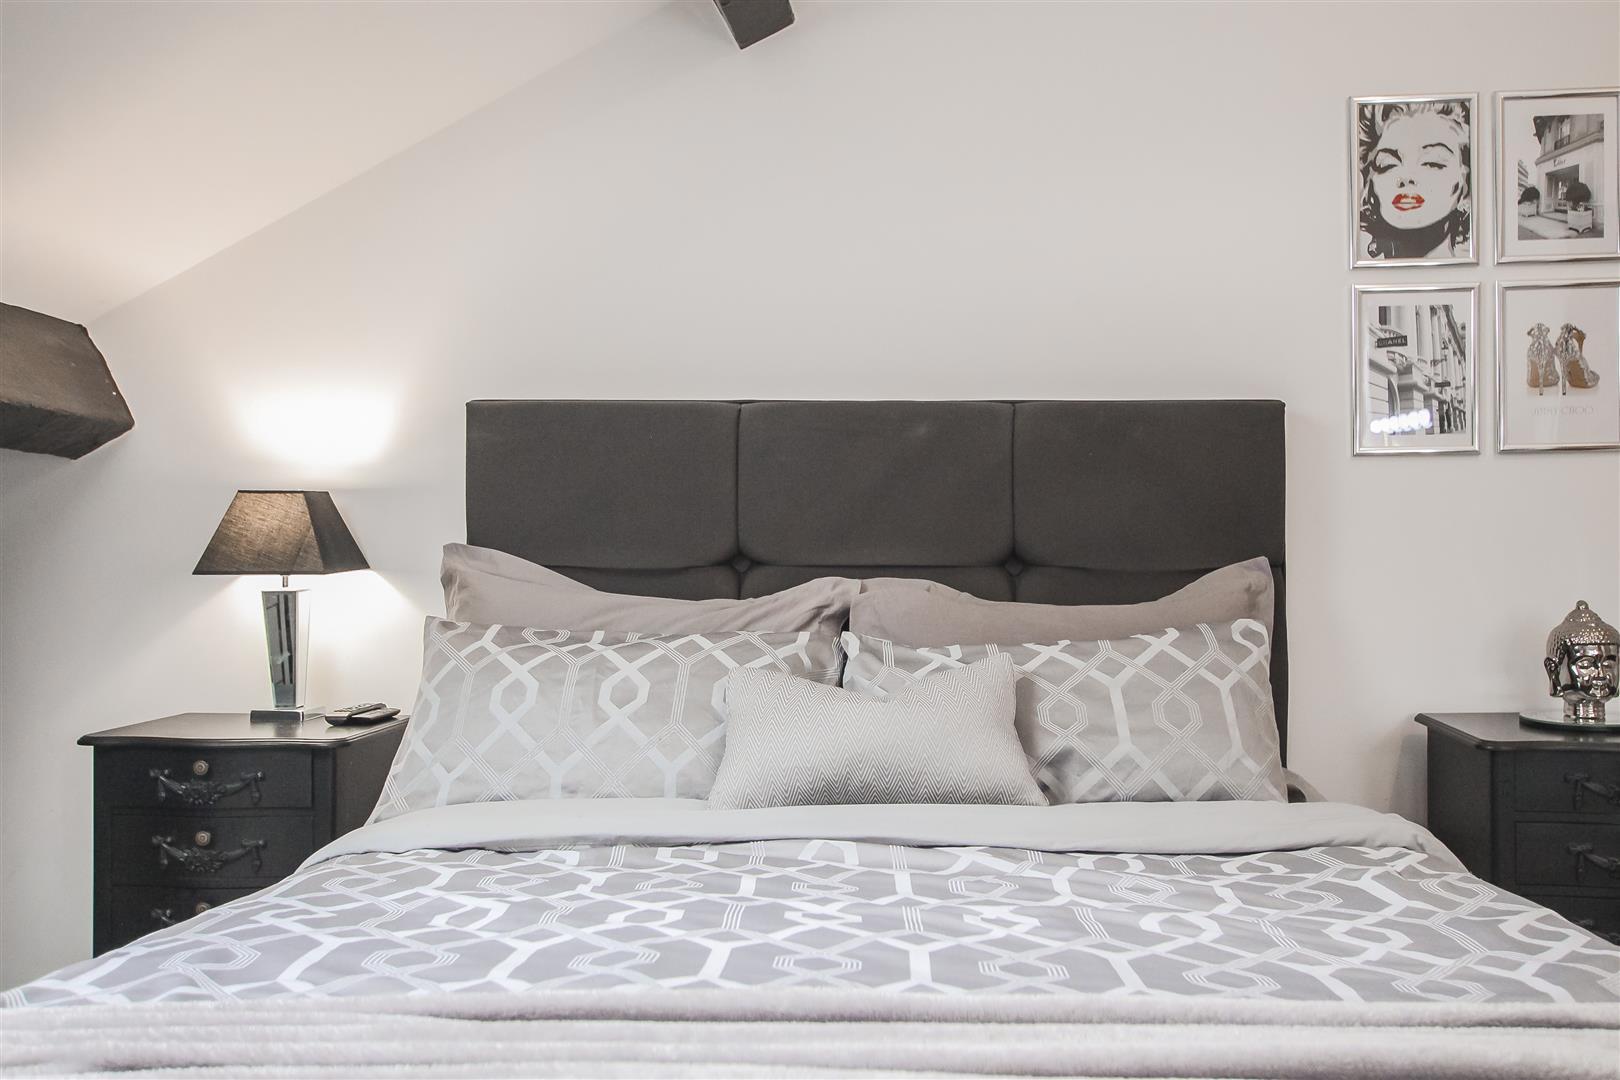 3 Bedroom Duplex Apartment For Sale - Image 40